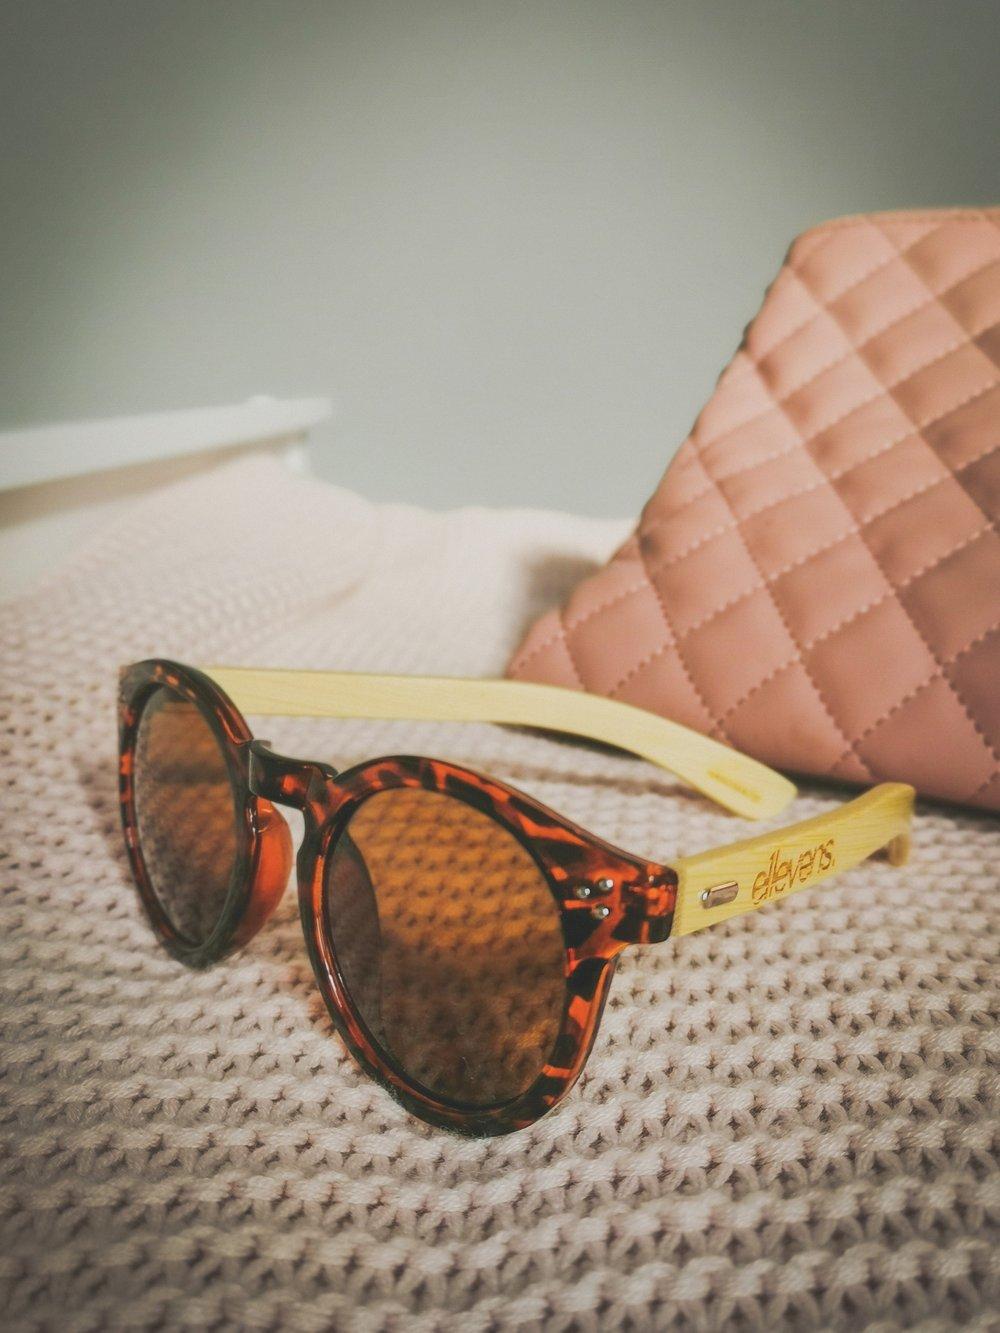 Image of E11evens - Ladies tortoise shell sunglasses